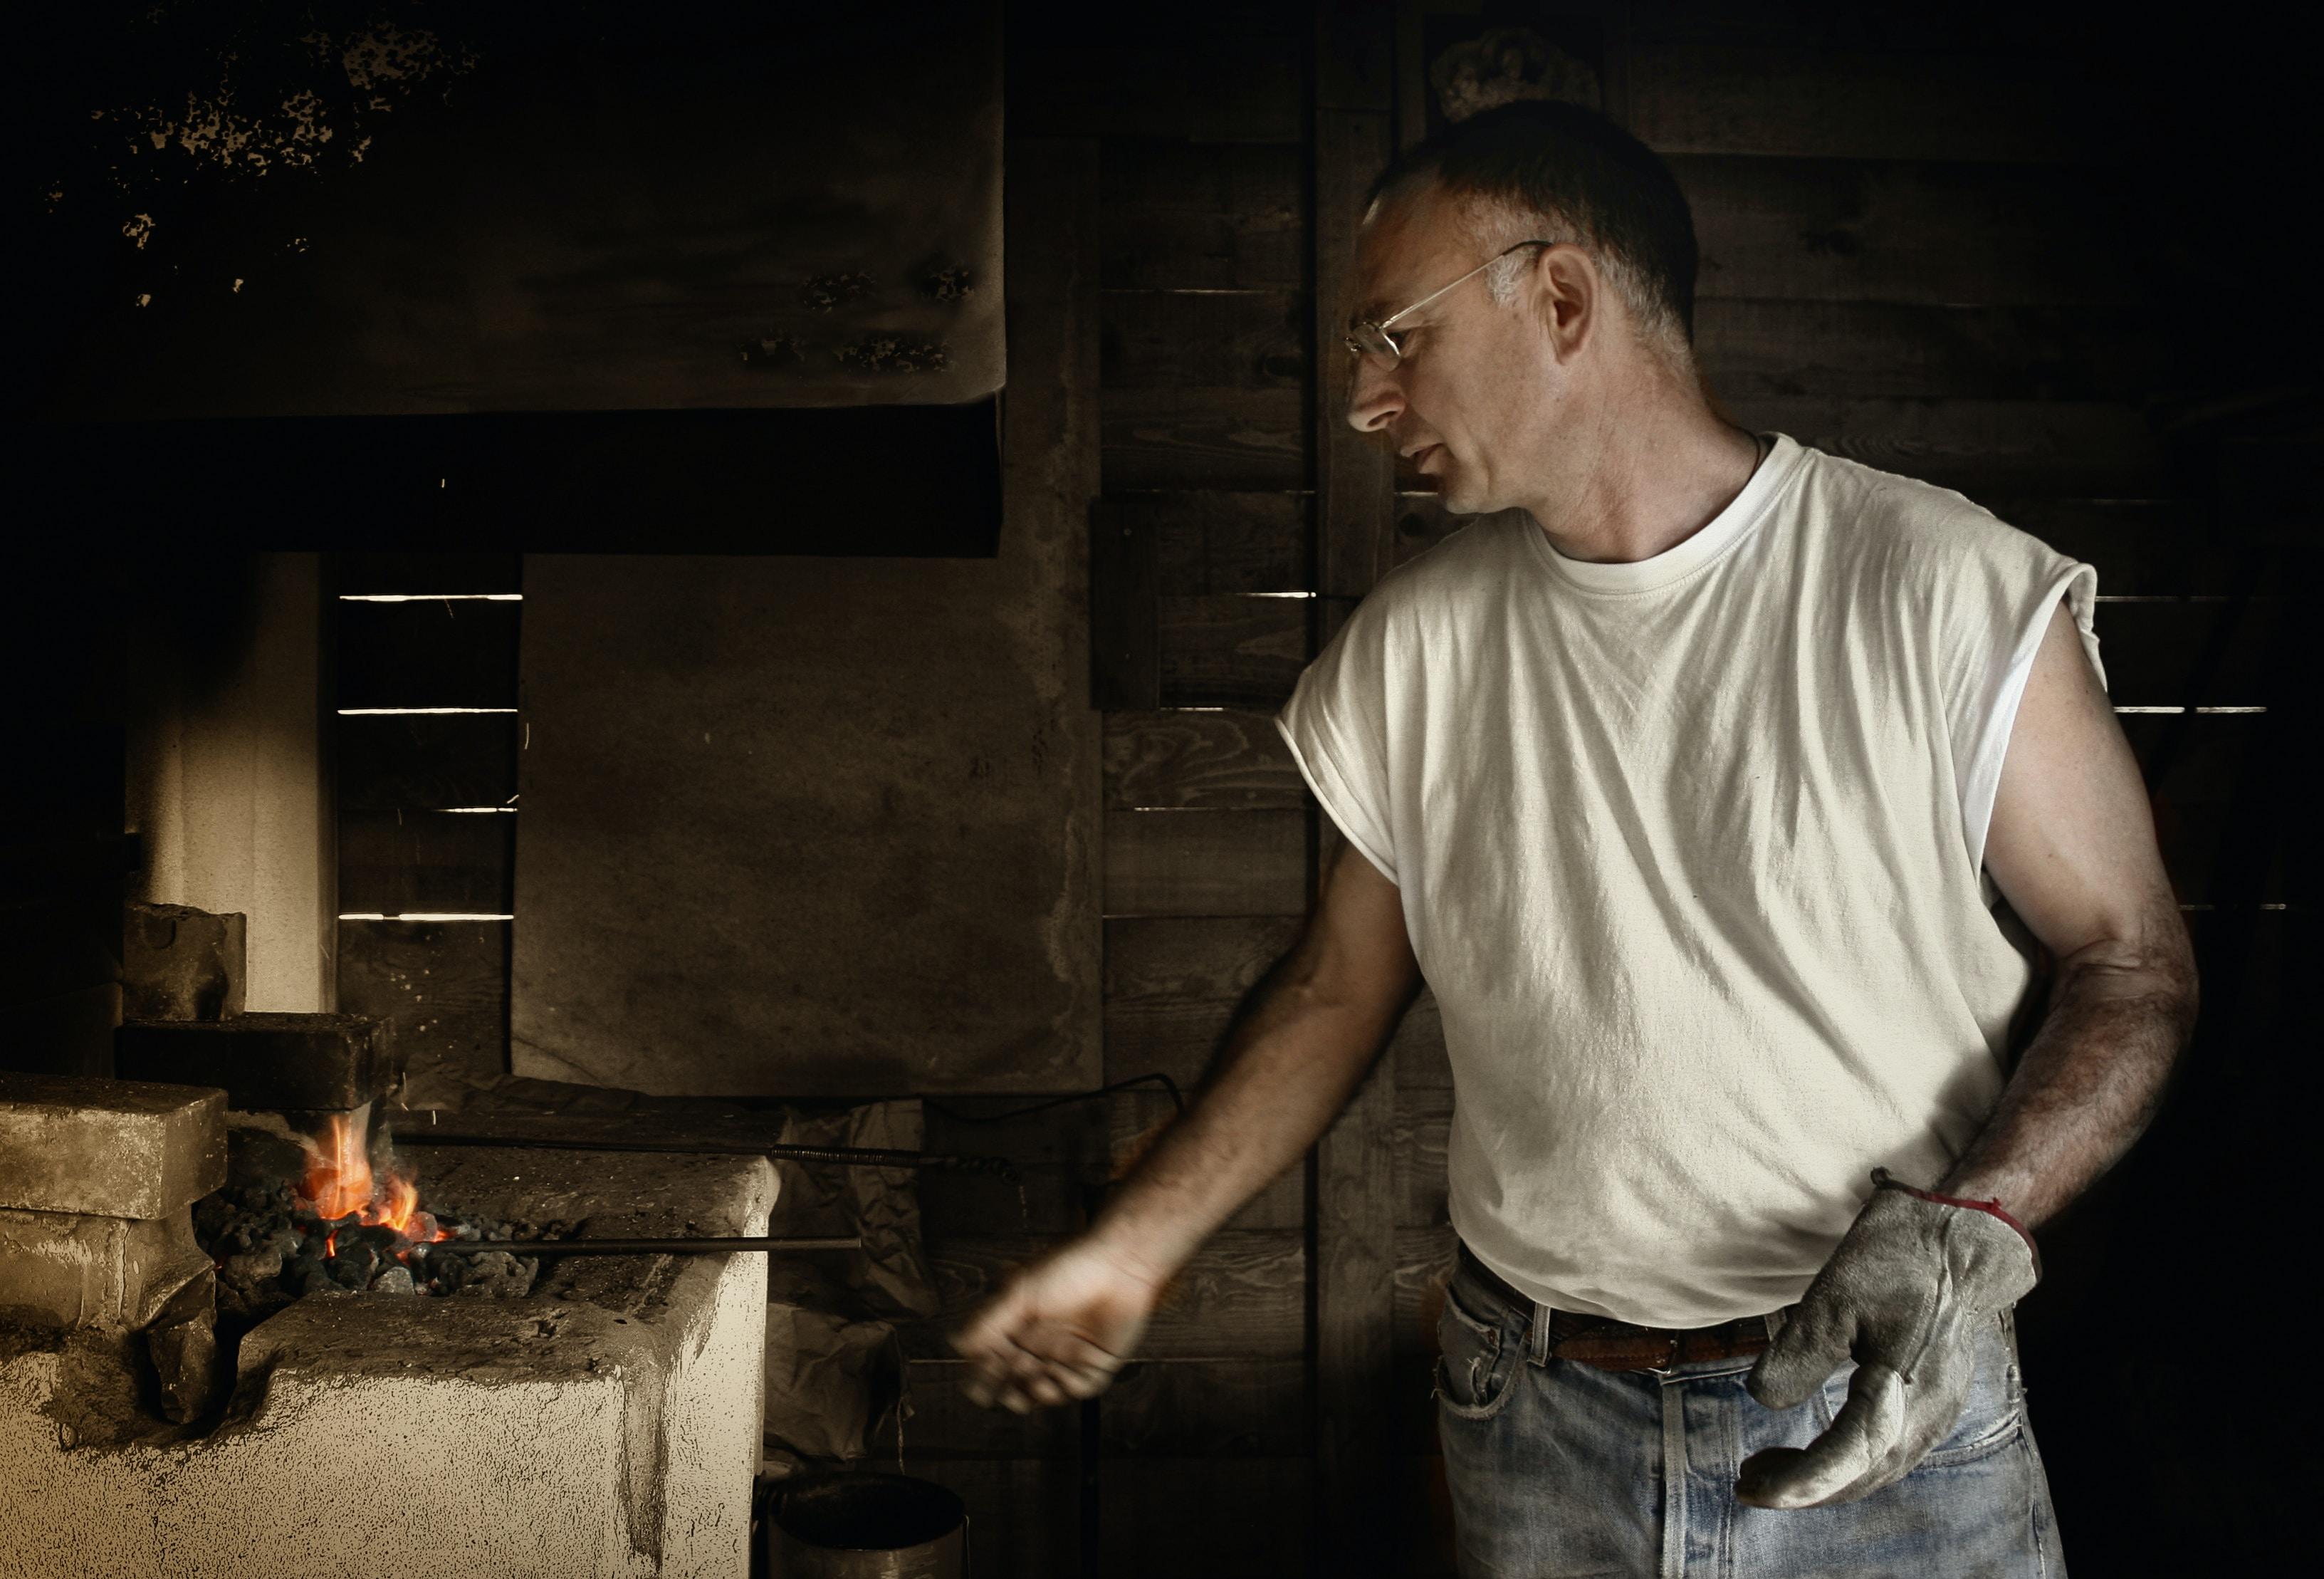 man standing near burner